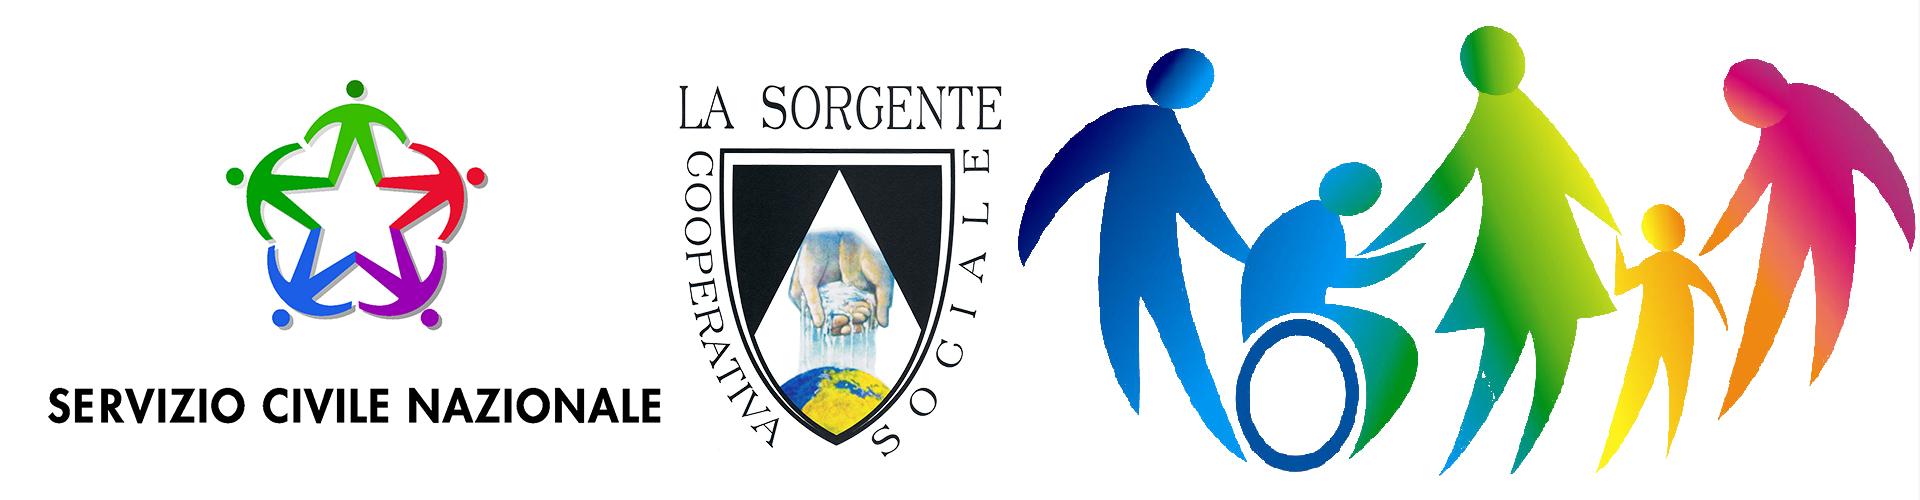 logo attivita